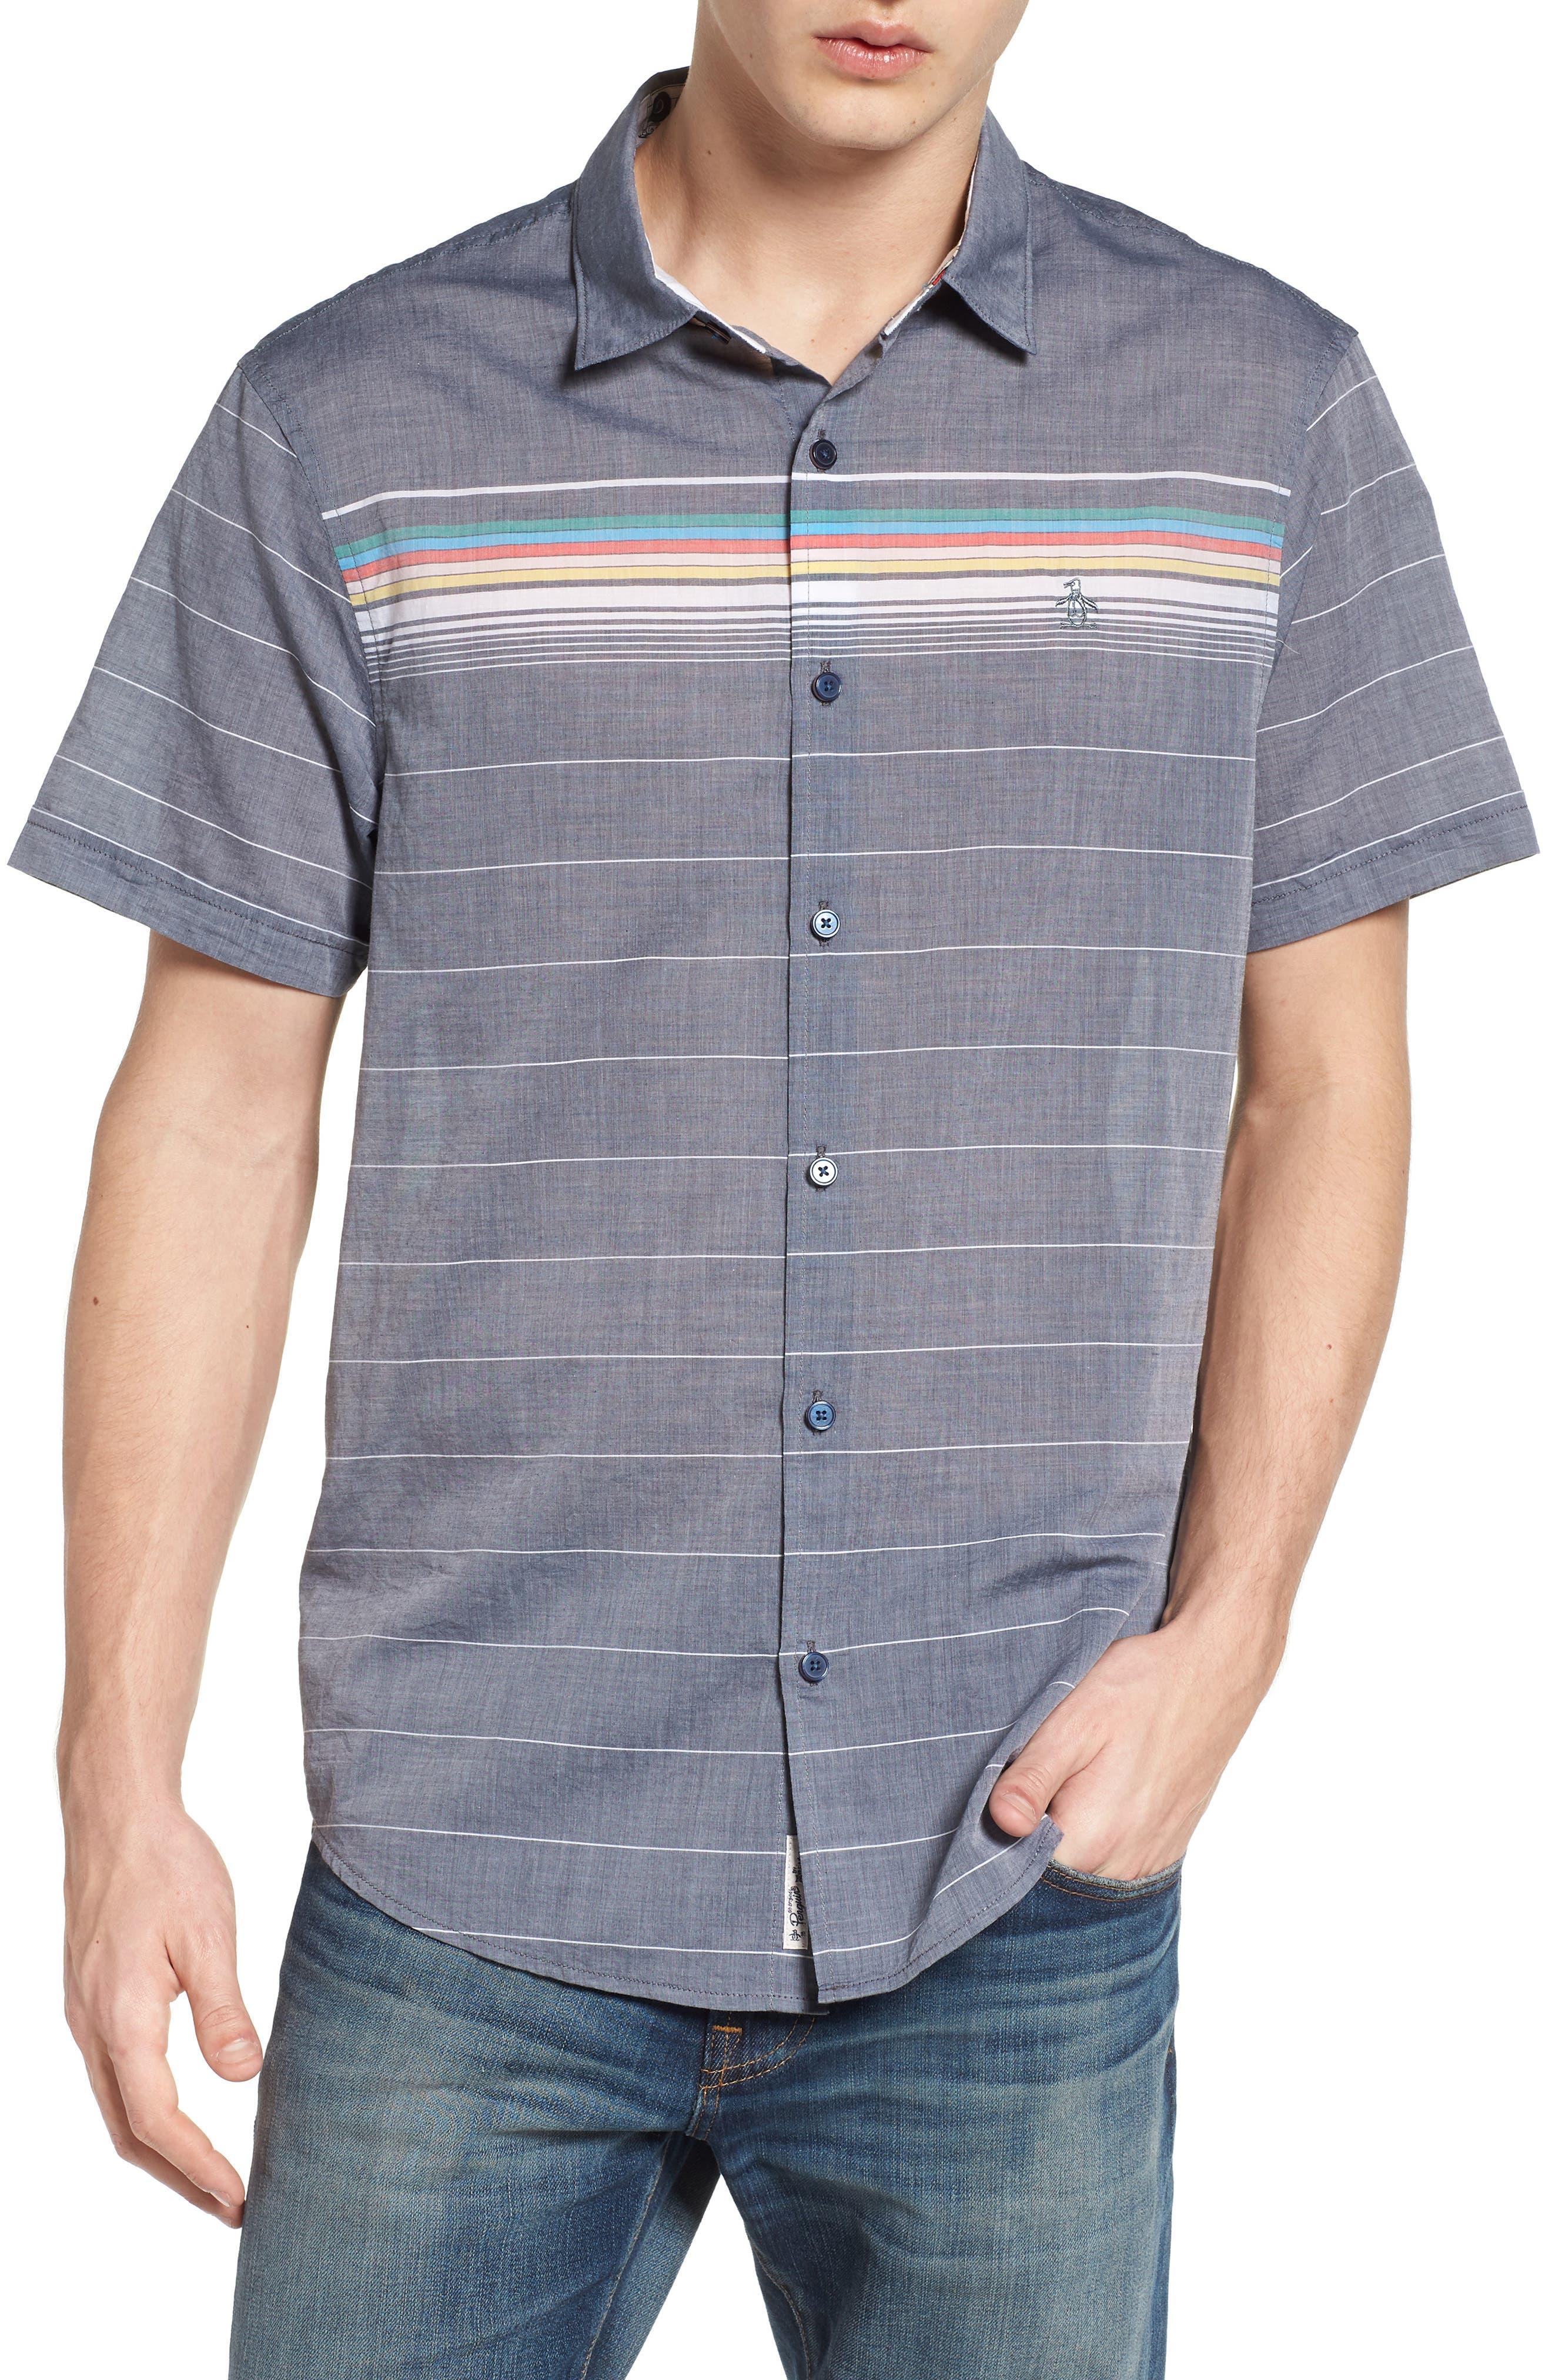 Engineered Stripe Woven Shirt,                             Main thumbnail 1, color,                             413